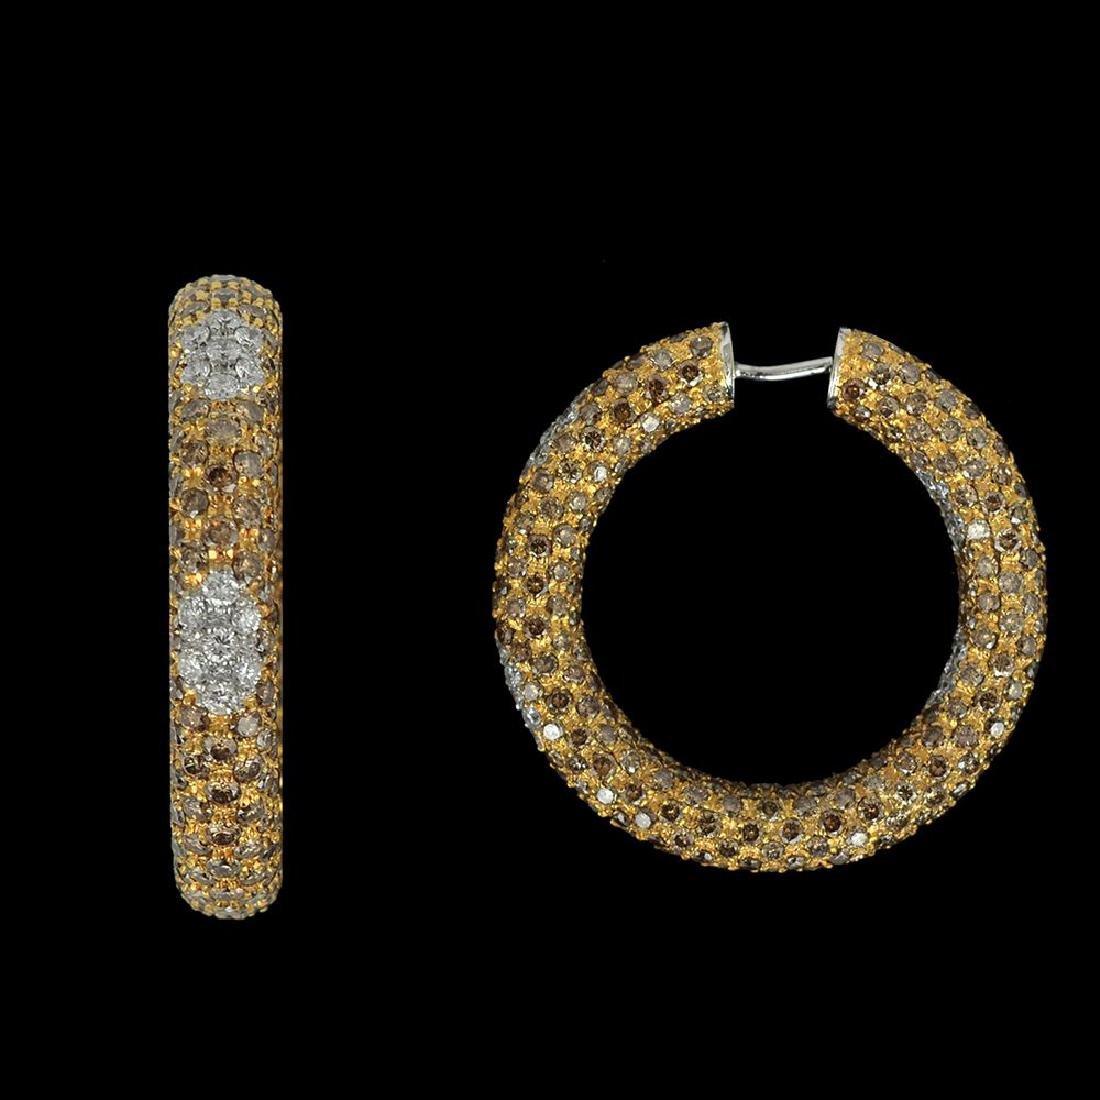 A PAIR OF 18K GOLD GYPSY EARRINGS